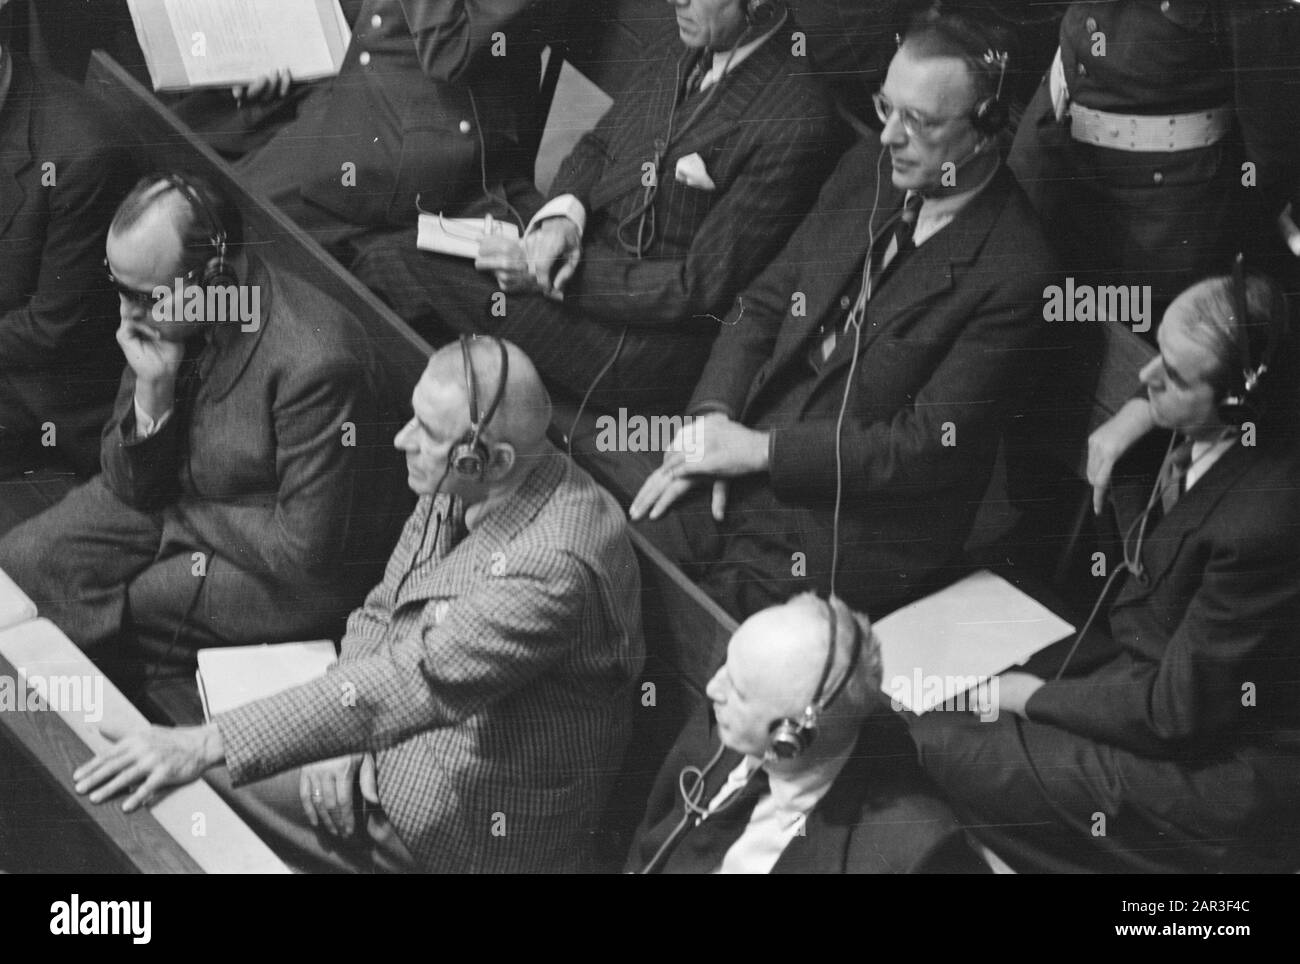 Process Nuremberg. Defended; with glasses Arthur Seyss-Inquart, right next to him Albert Speer Date: 4 December 1945 Location: Germany, Nuremberg Keywords: war criminals, trials, justice, World War II Personal name: Seyss-Inquart, Arthur, Spear, Albert Stock Photo